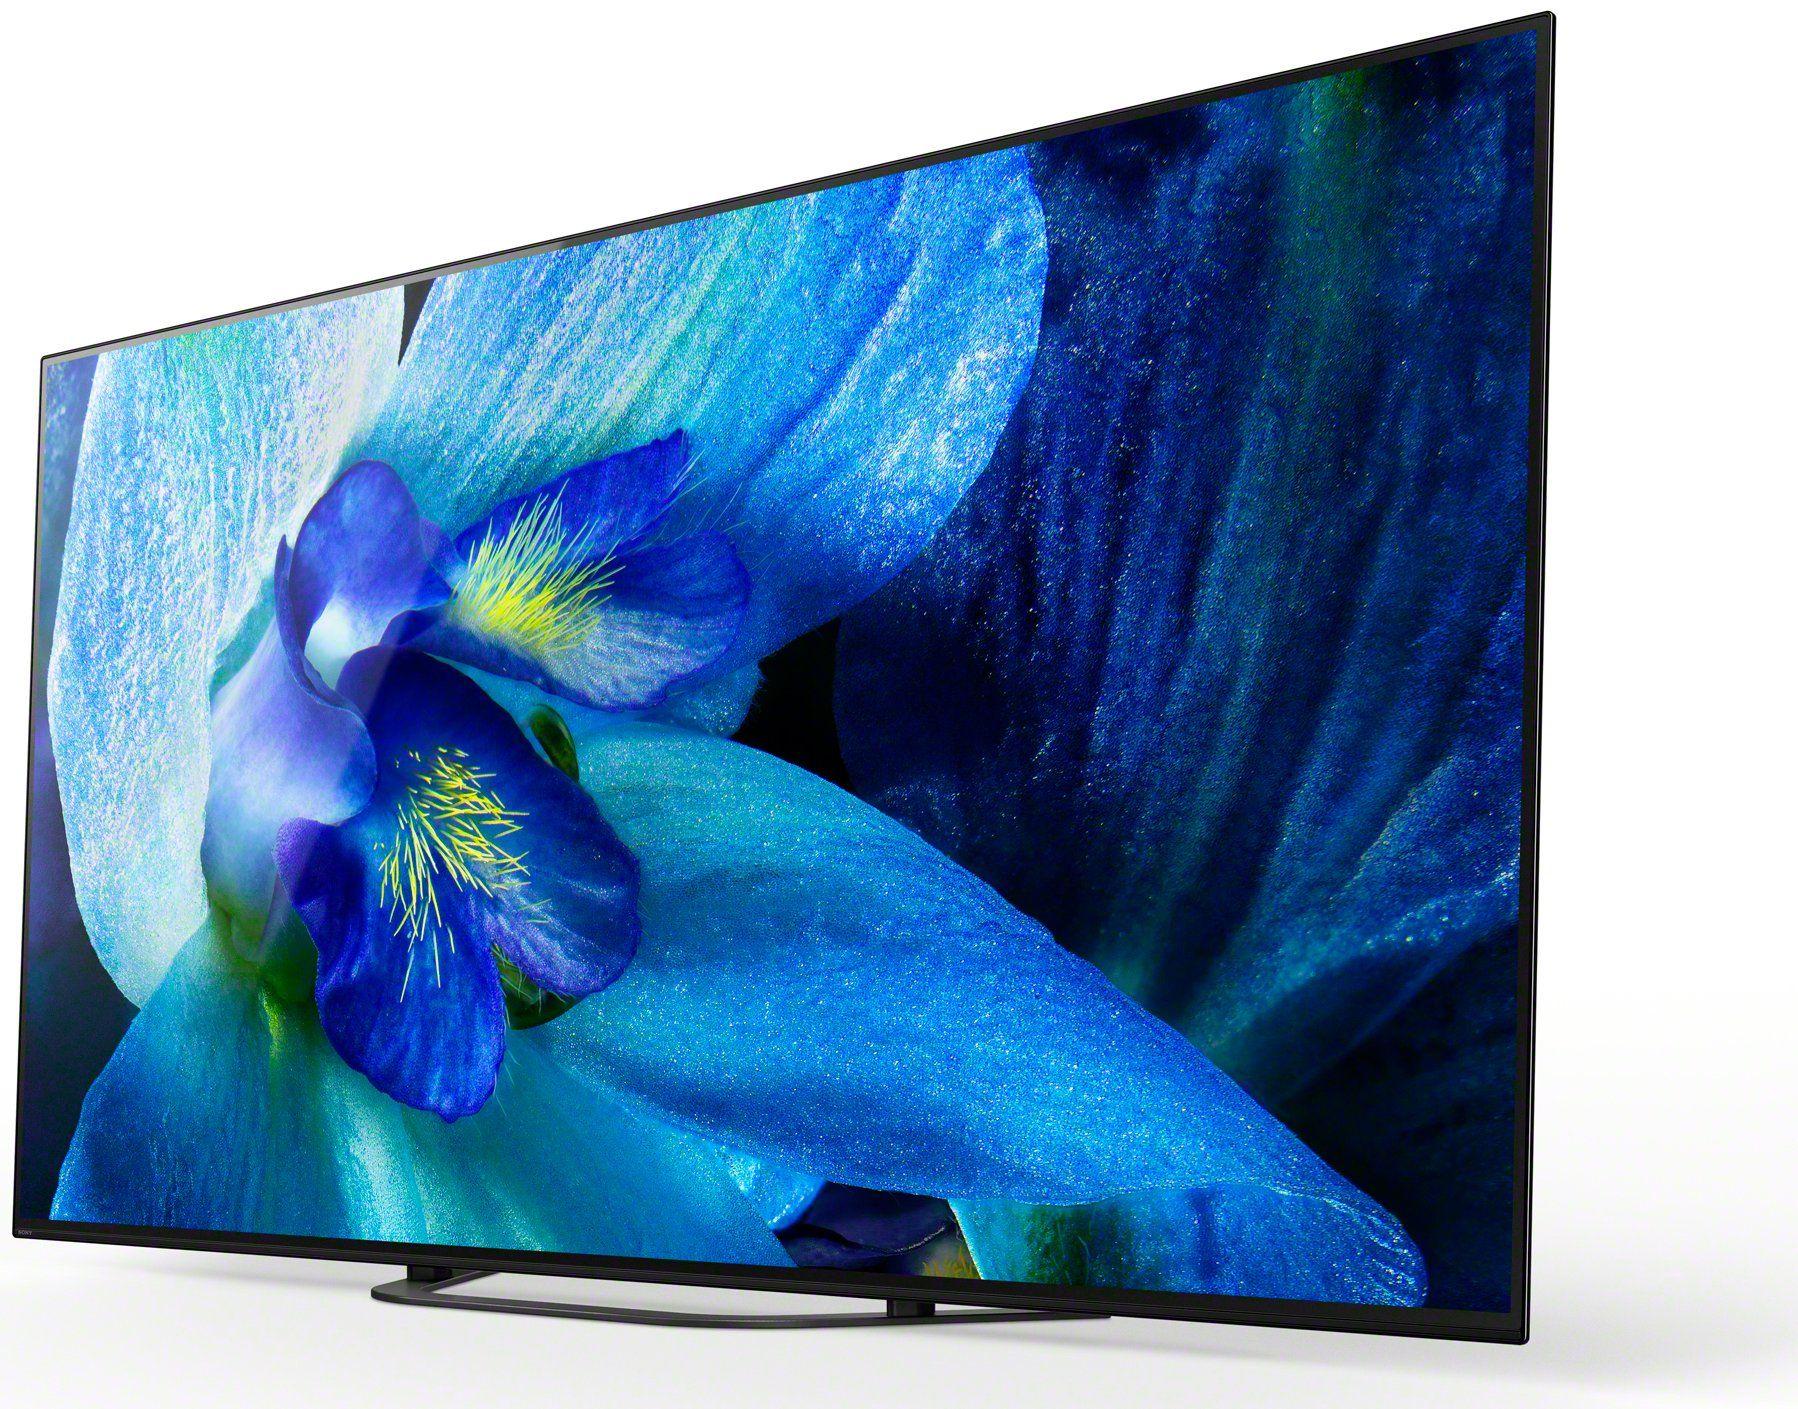 Sony Bravia A8g 55 Inch Oled 4k Uhd Smart Tv Oled Tv Smart Tv Oled 4k Tv